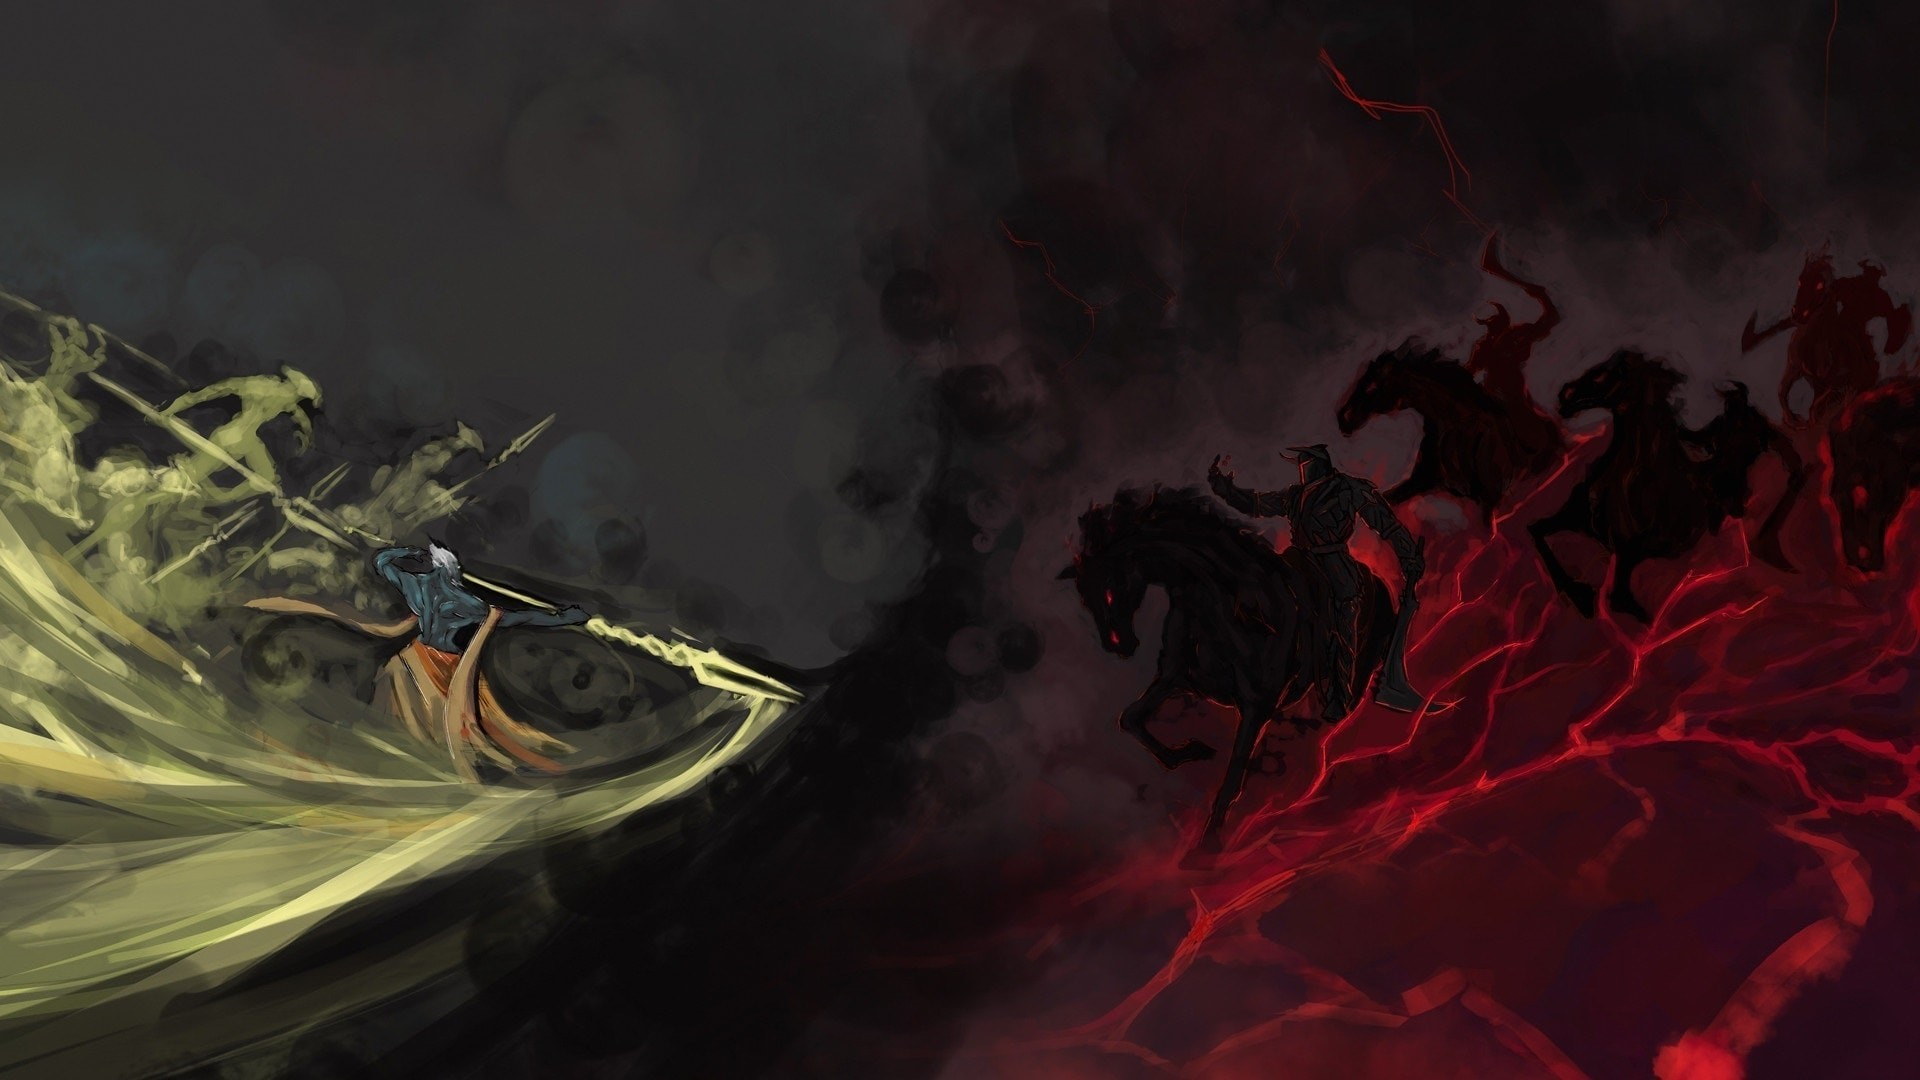 … Dota2 : Chaos Knight full hd wallpapers